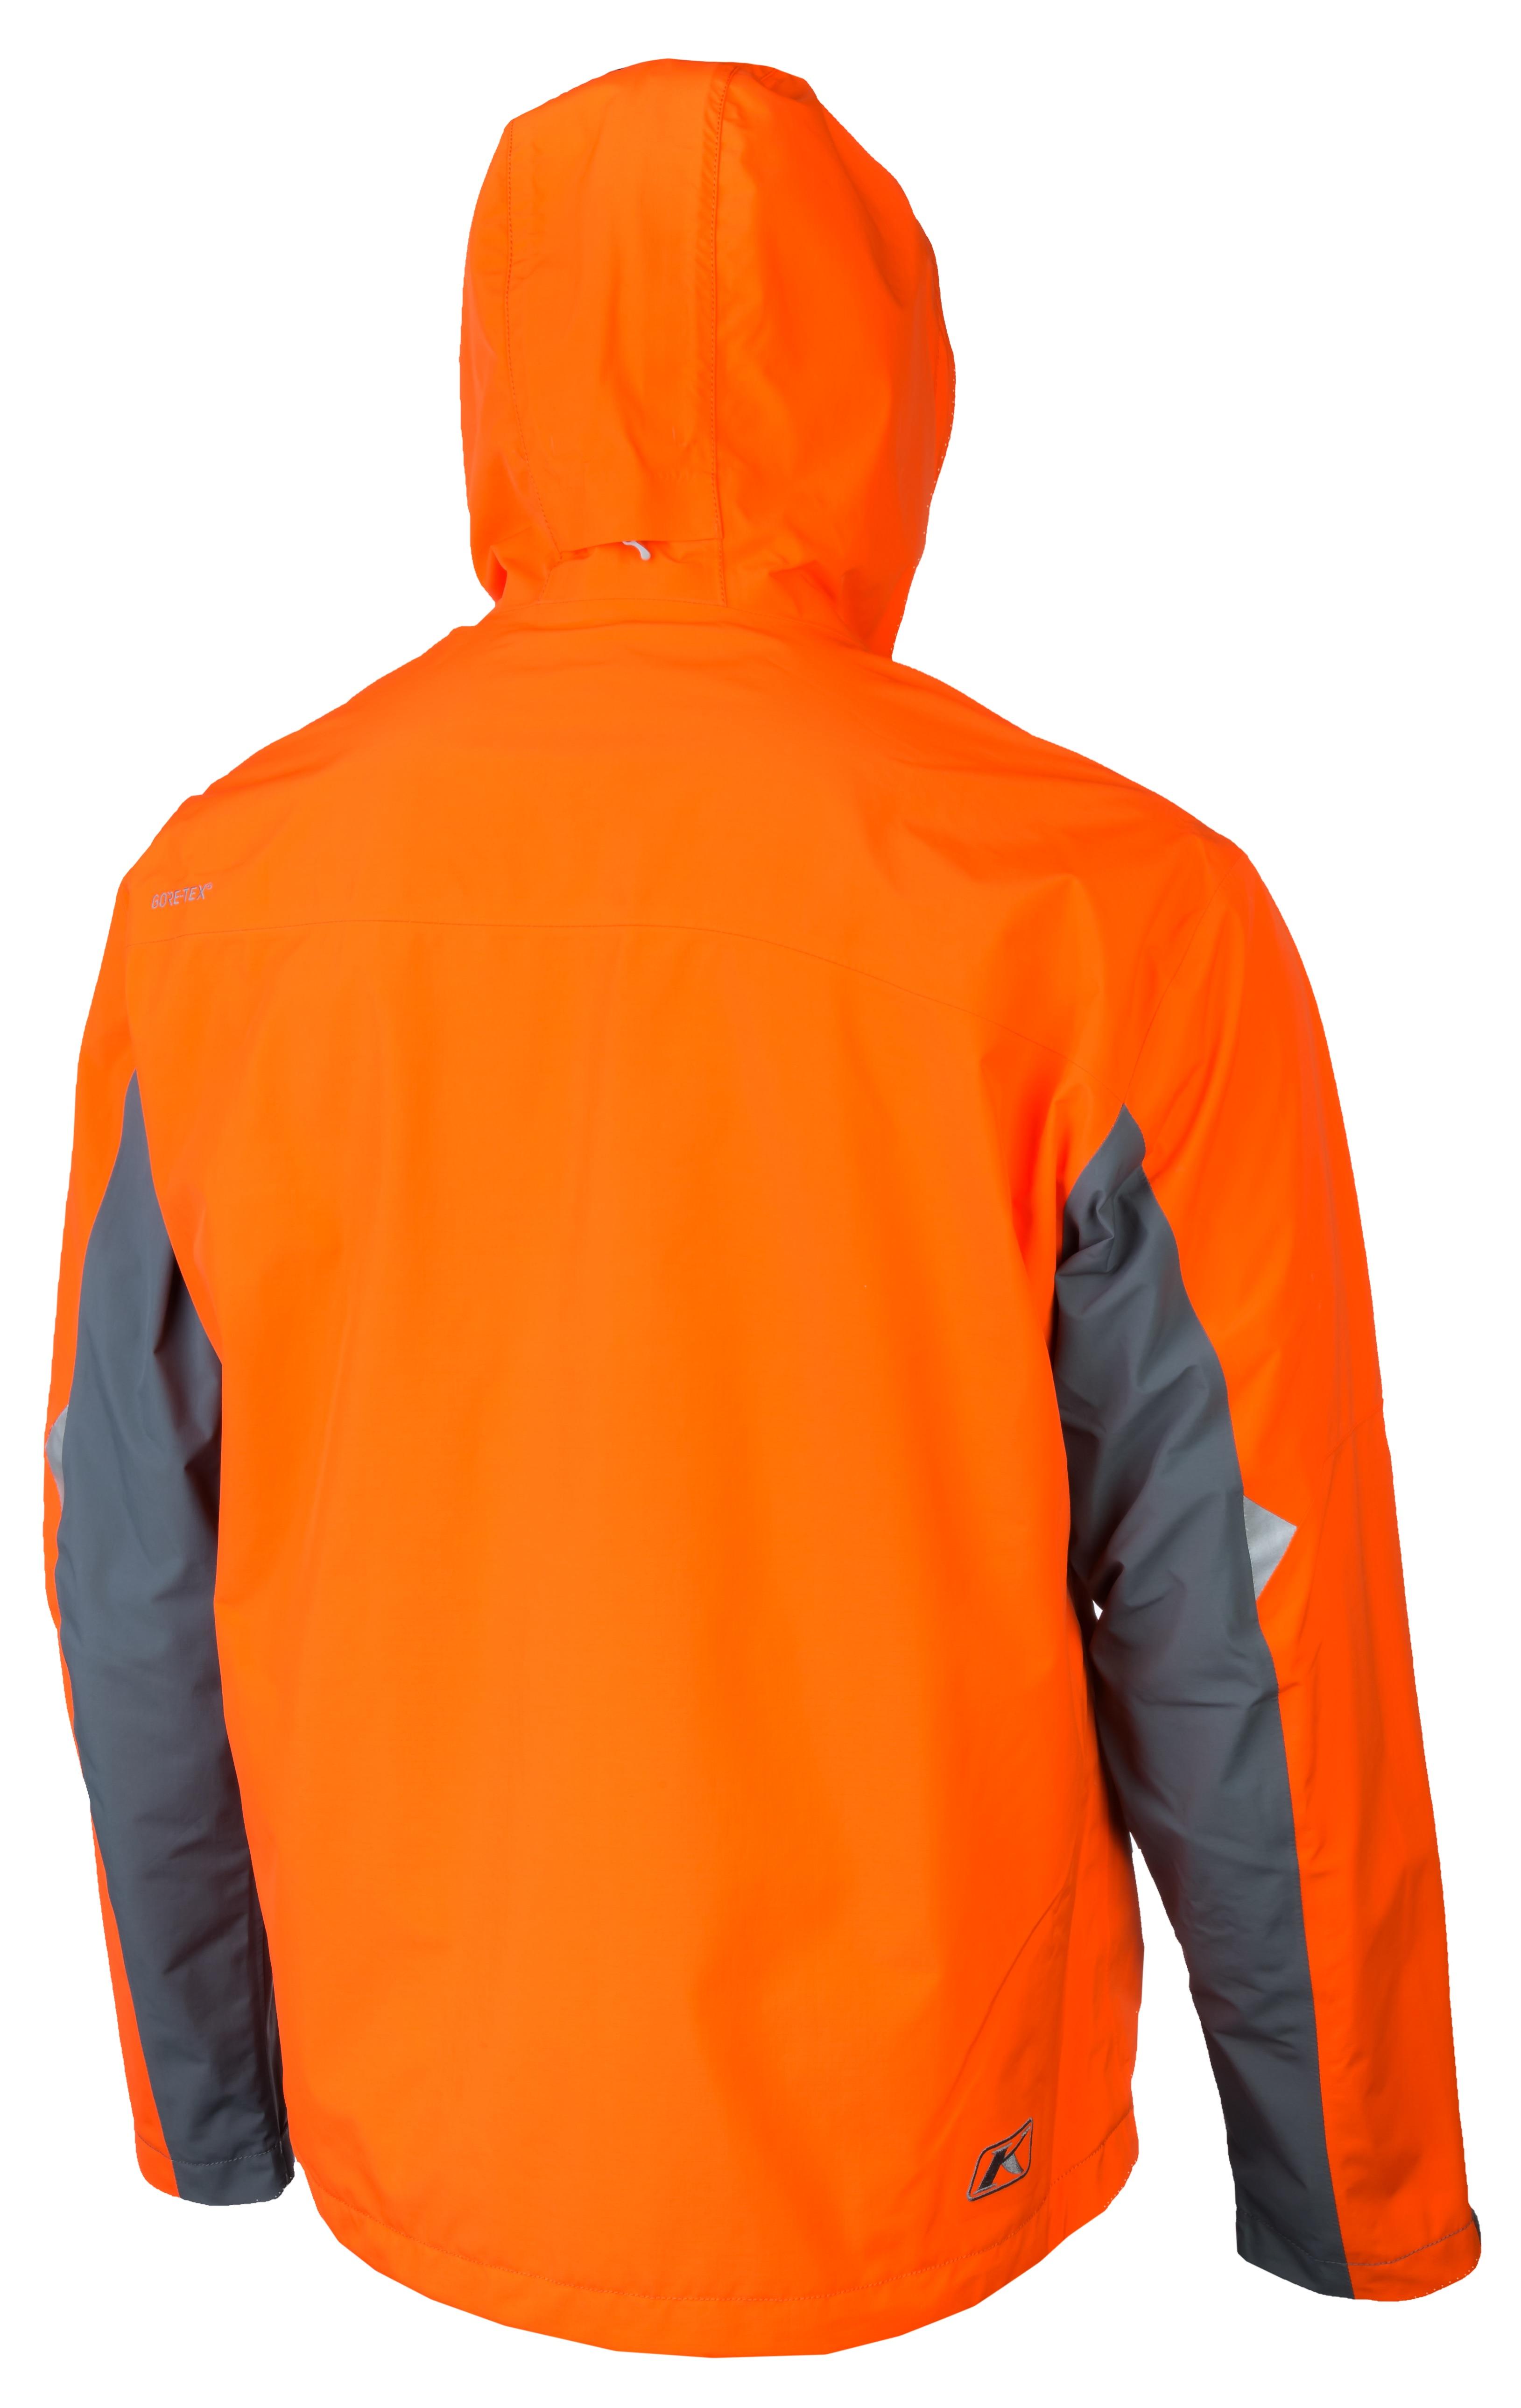 Stow Away Jacket 3148-003_Orange_02